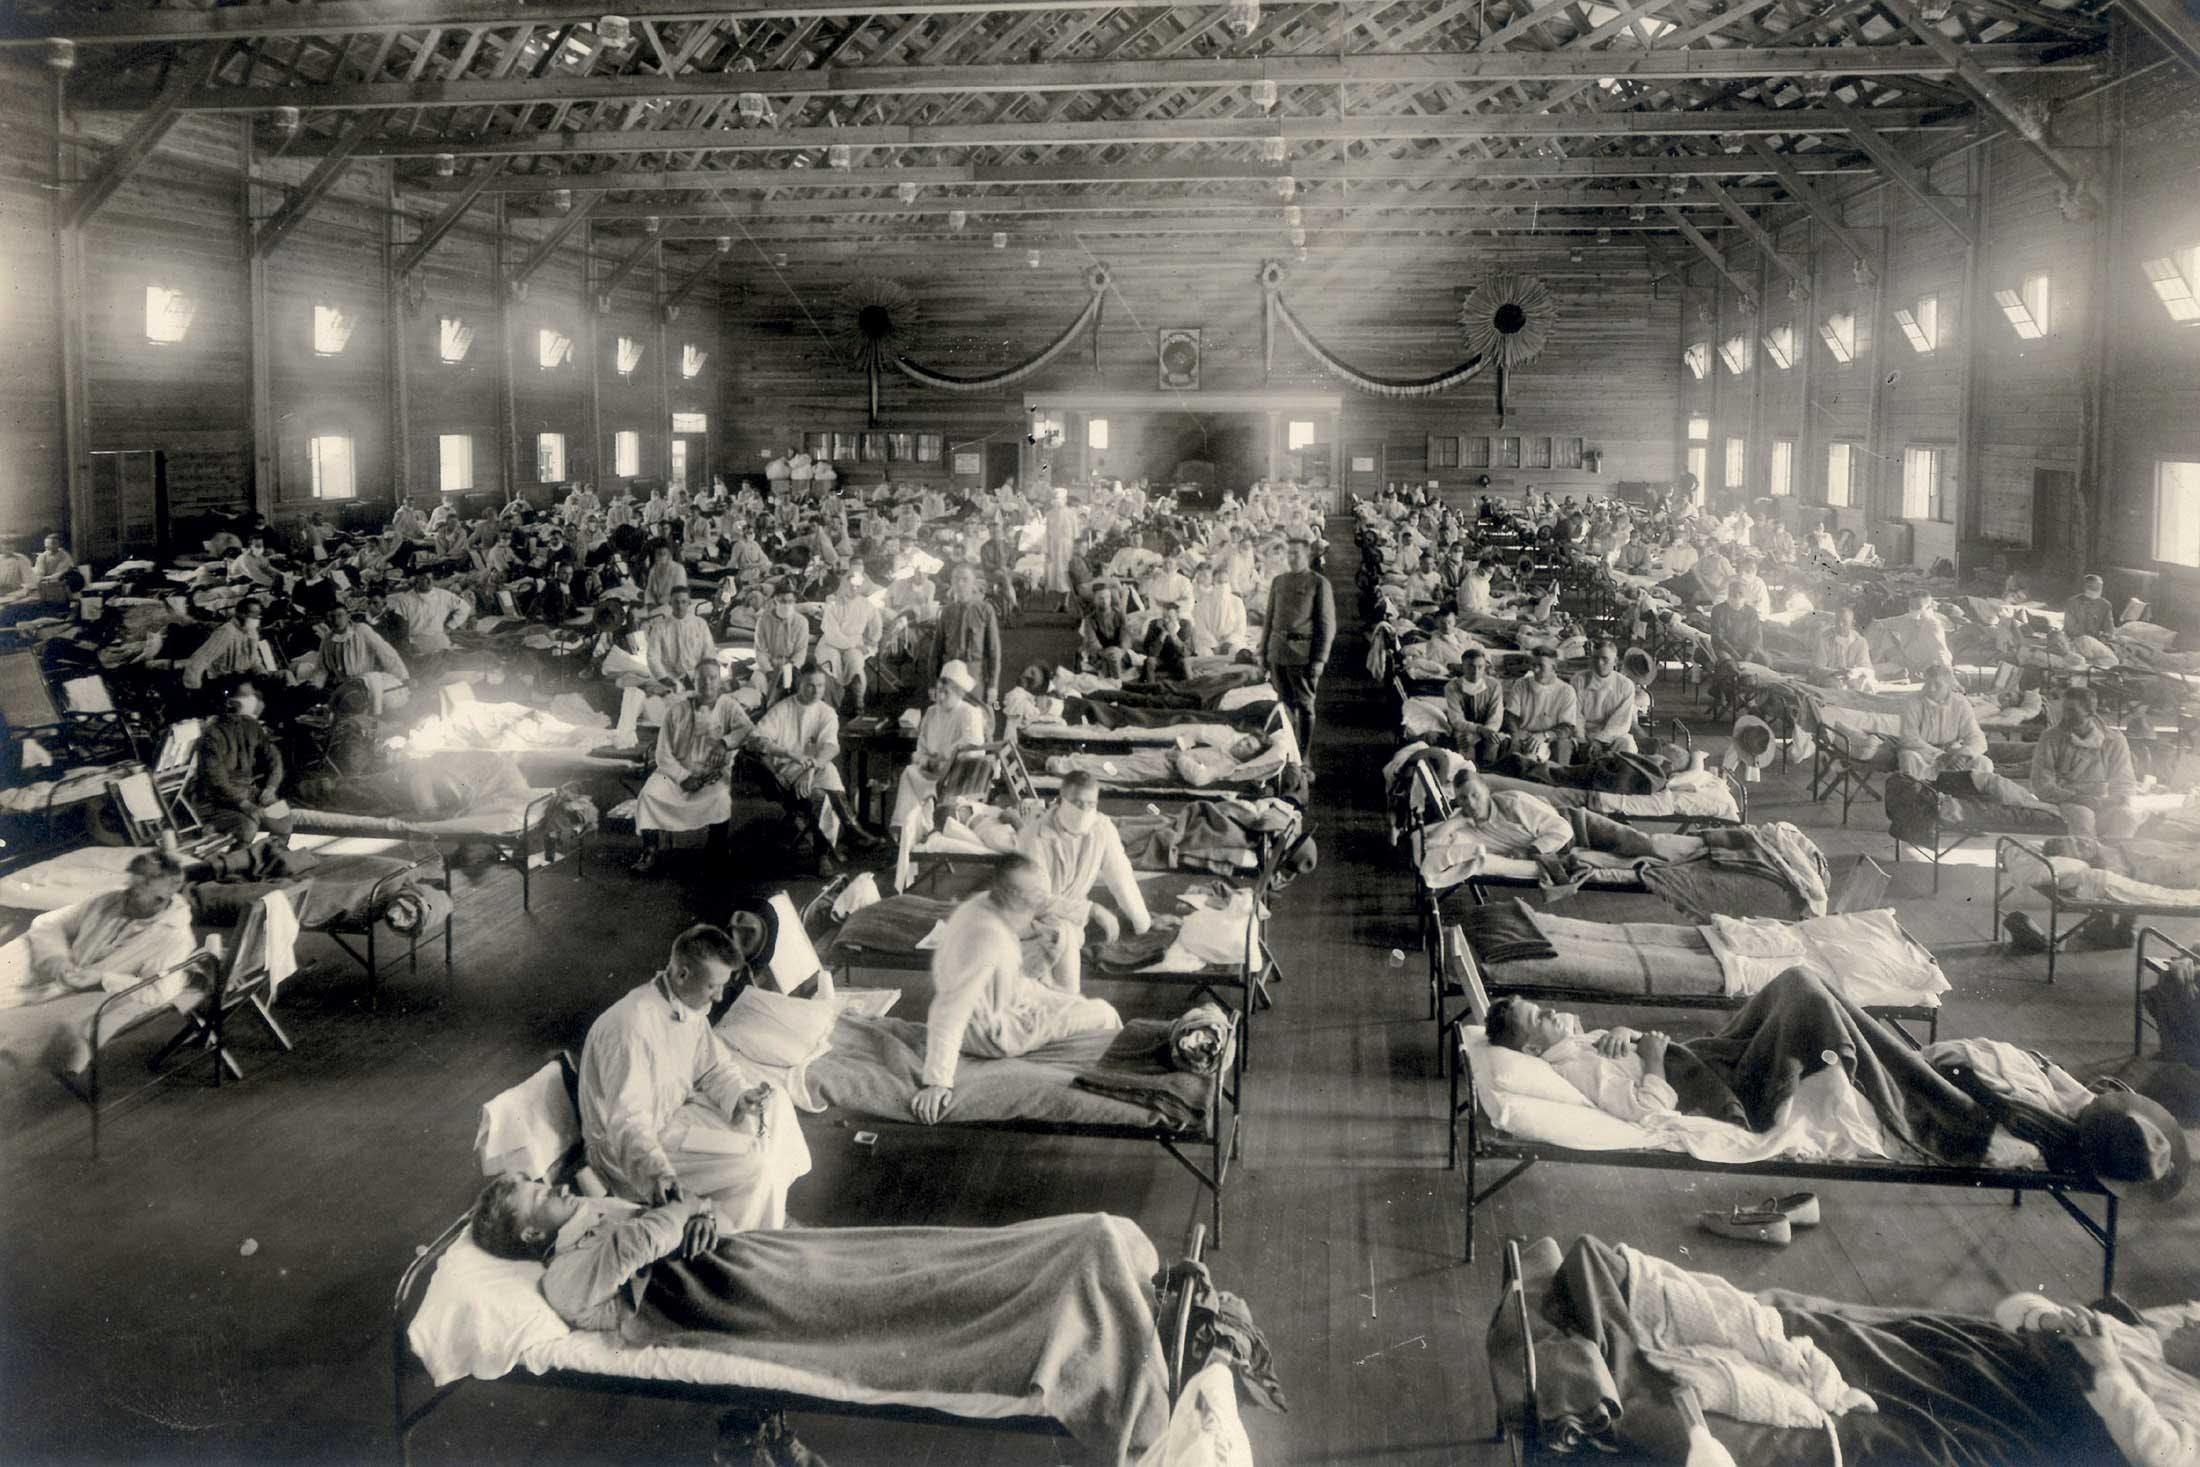 Sp flu ward 2